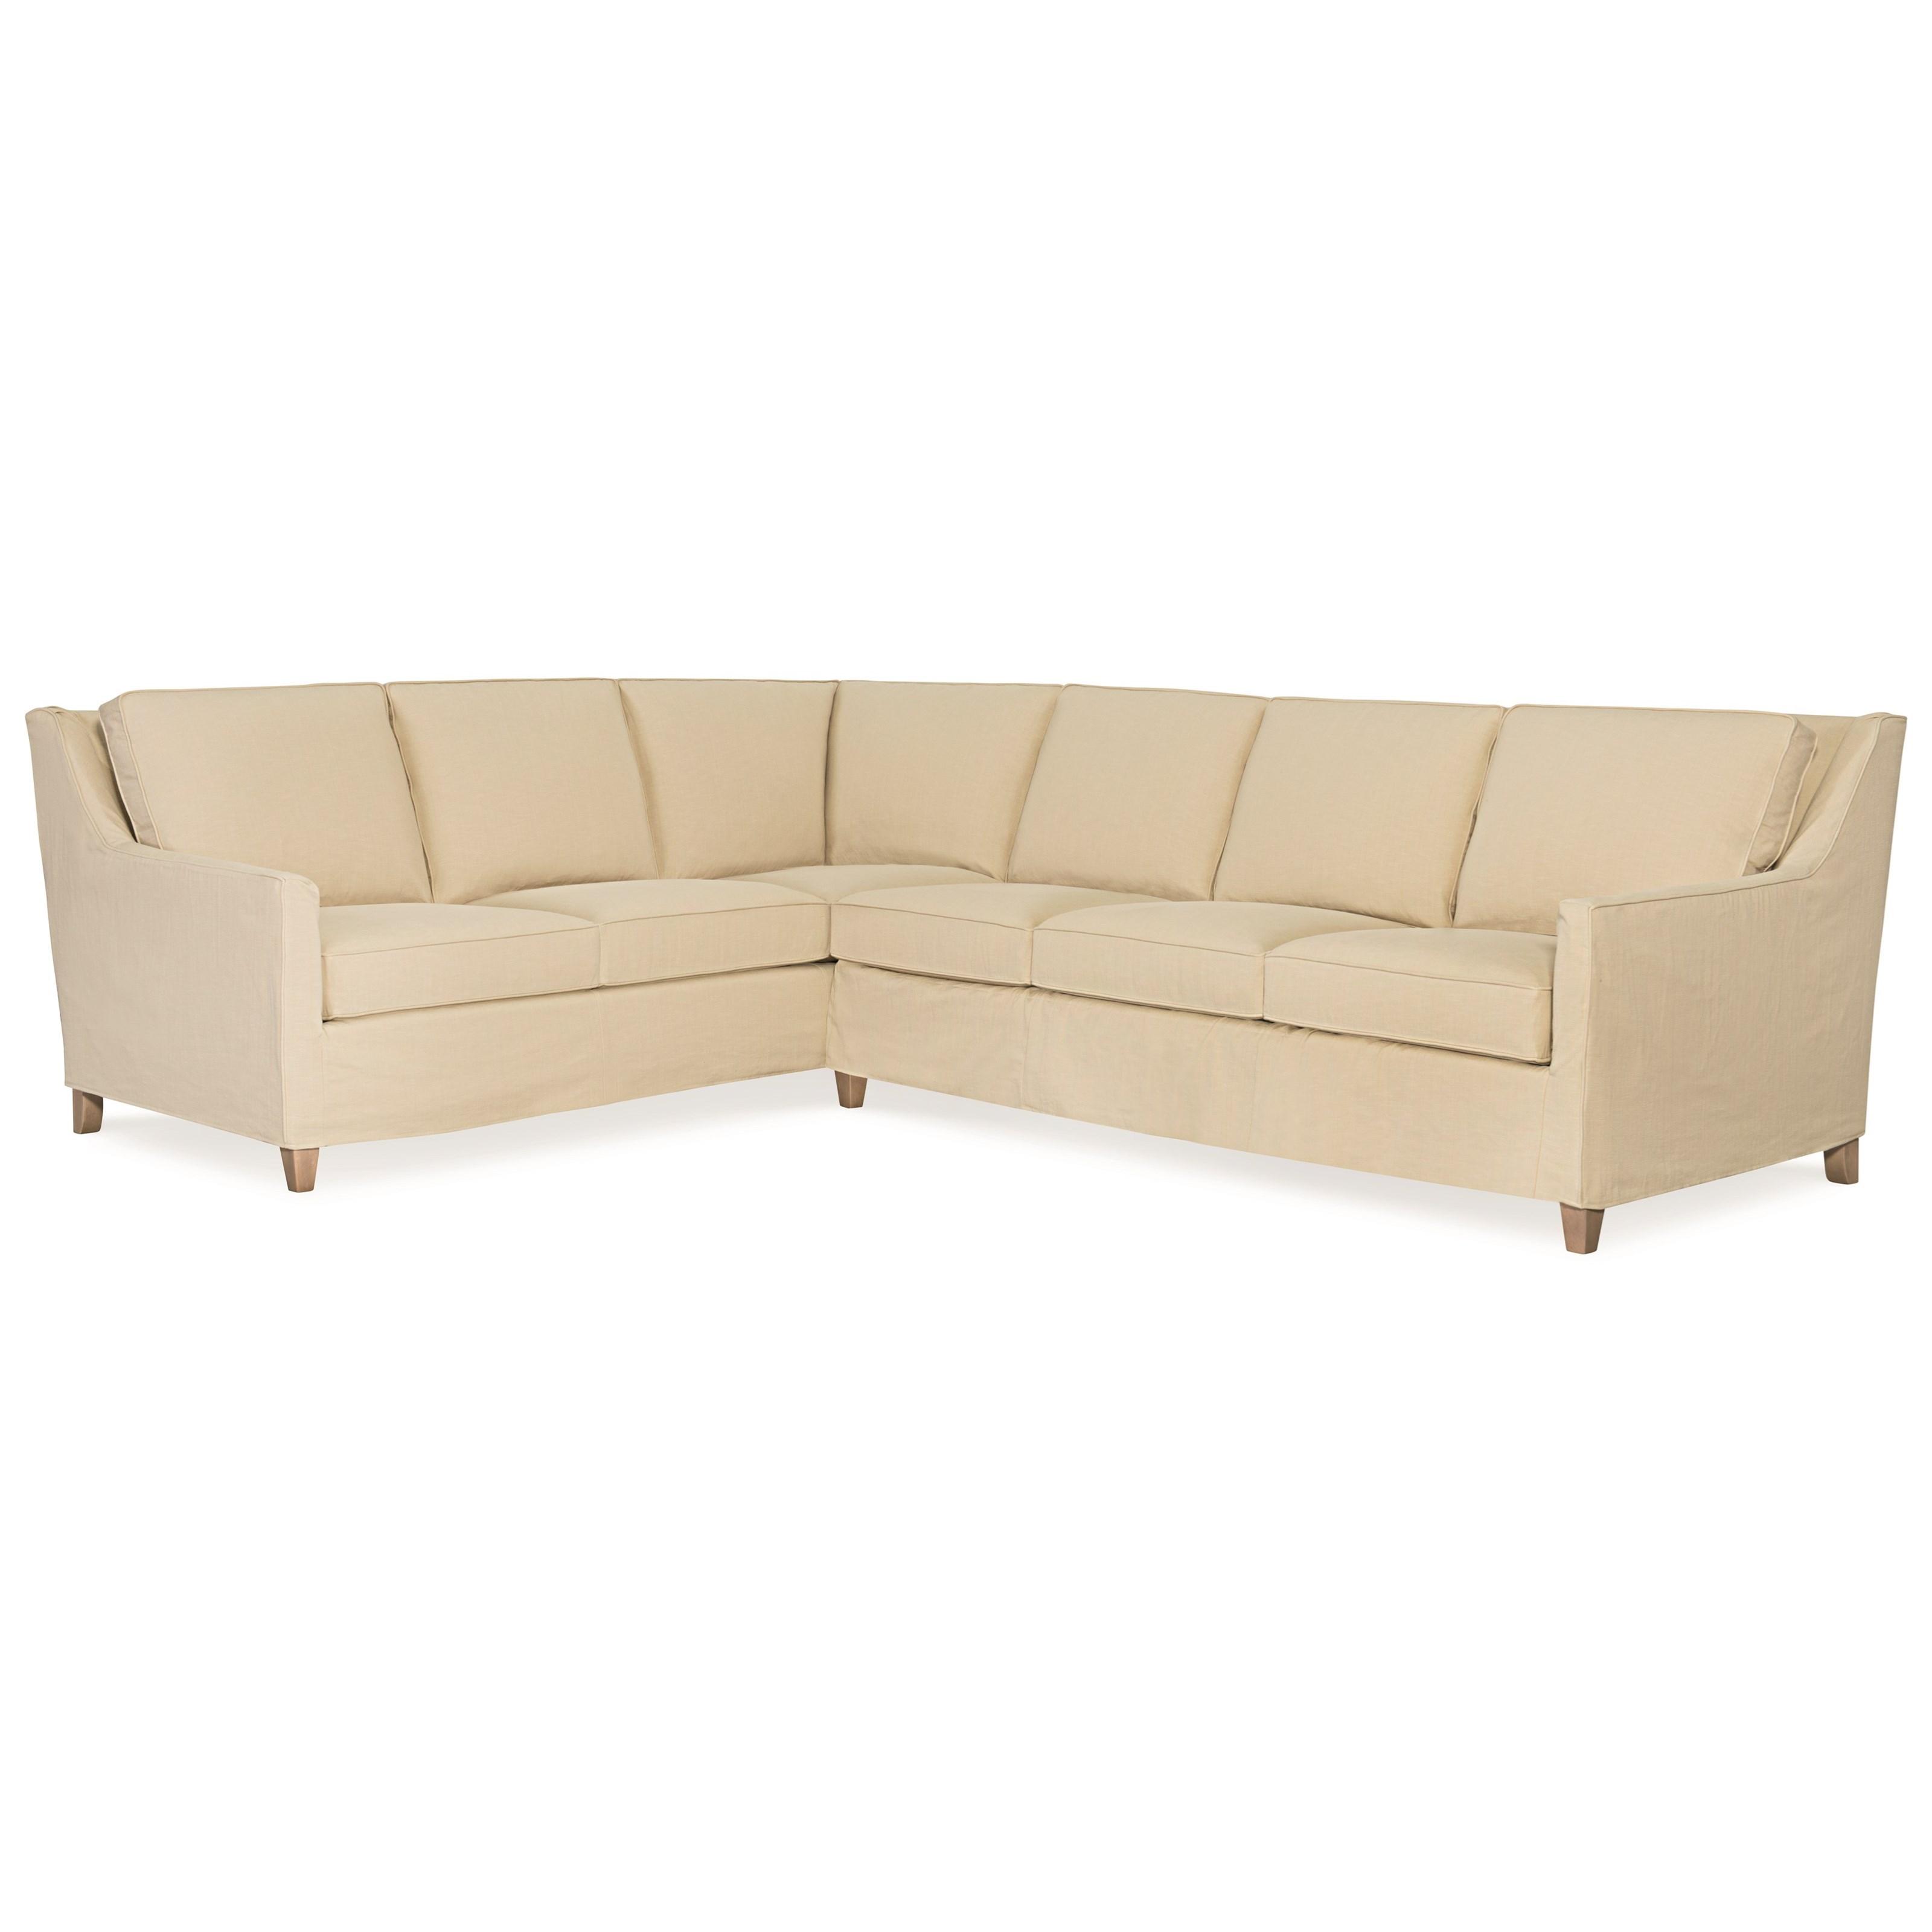 Piece Slipcover Sectional Sofa